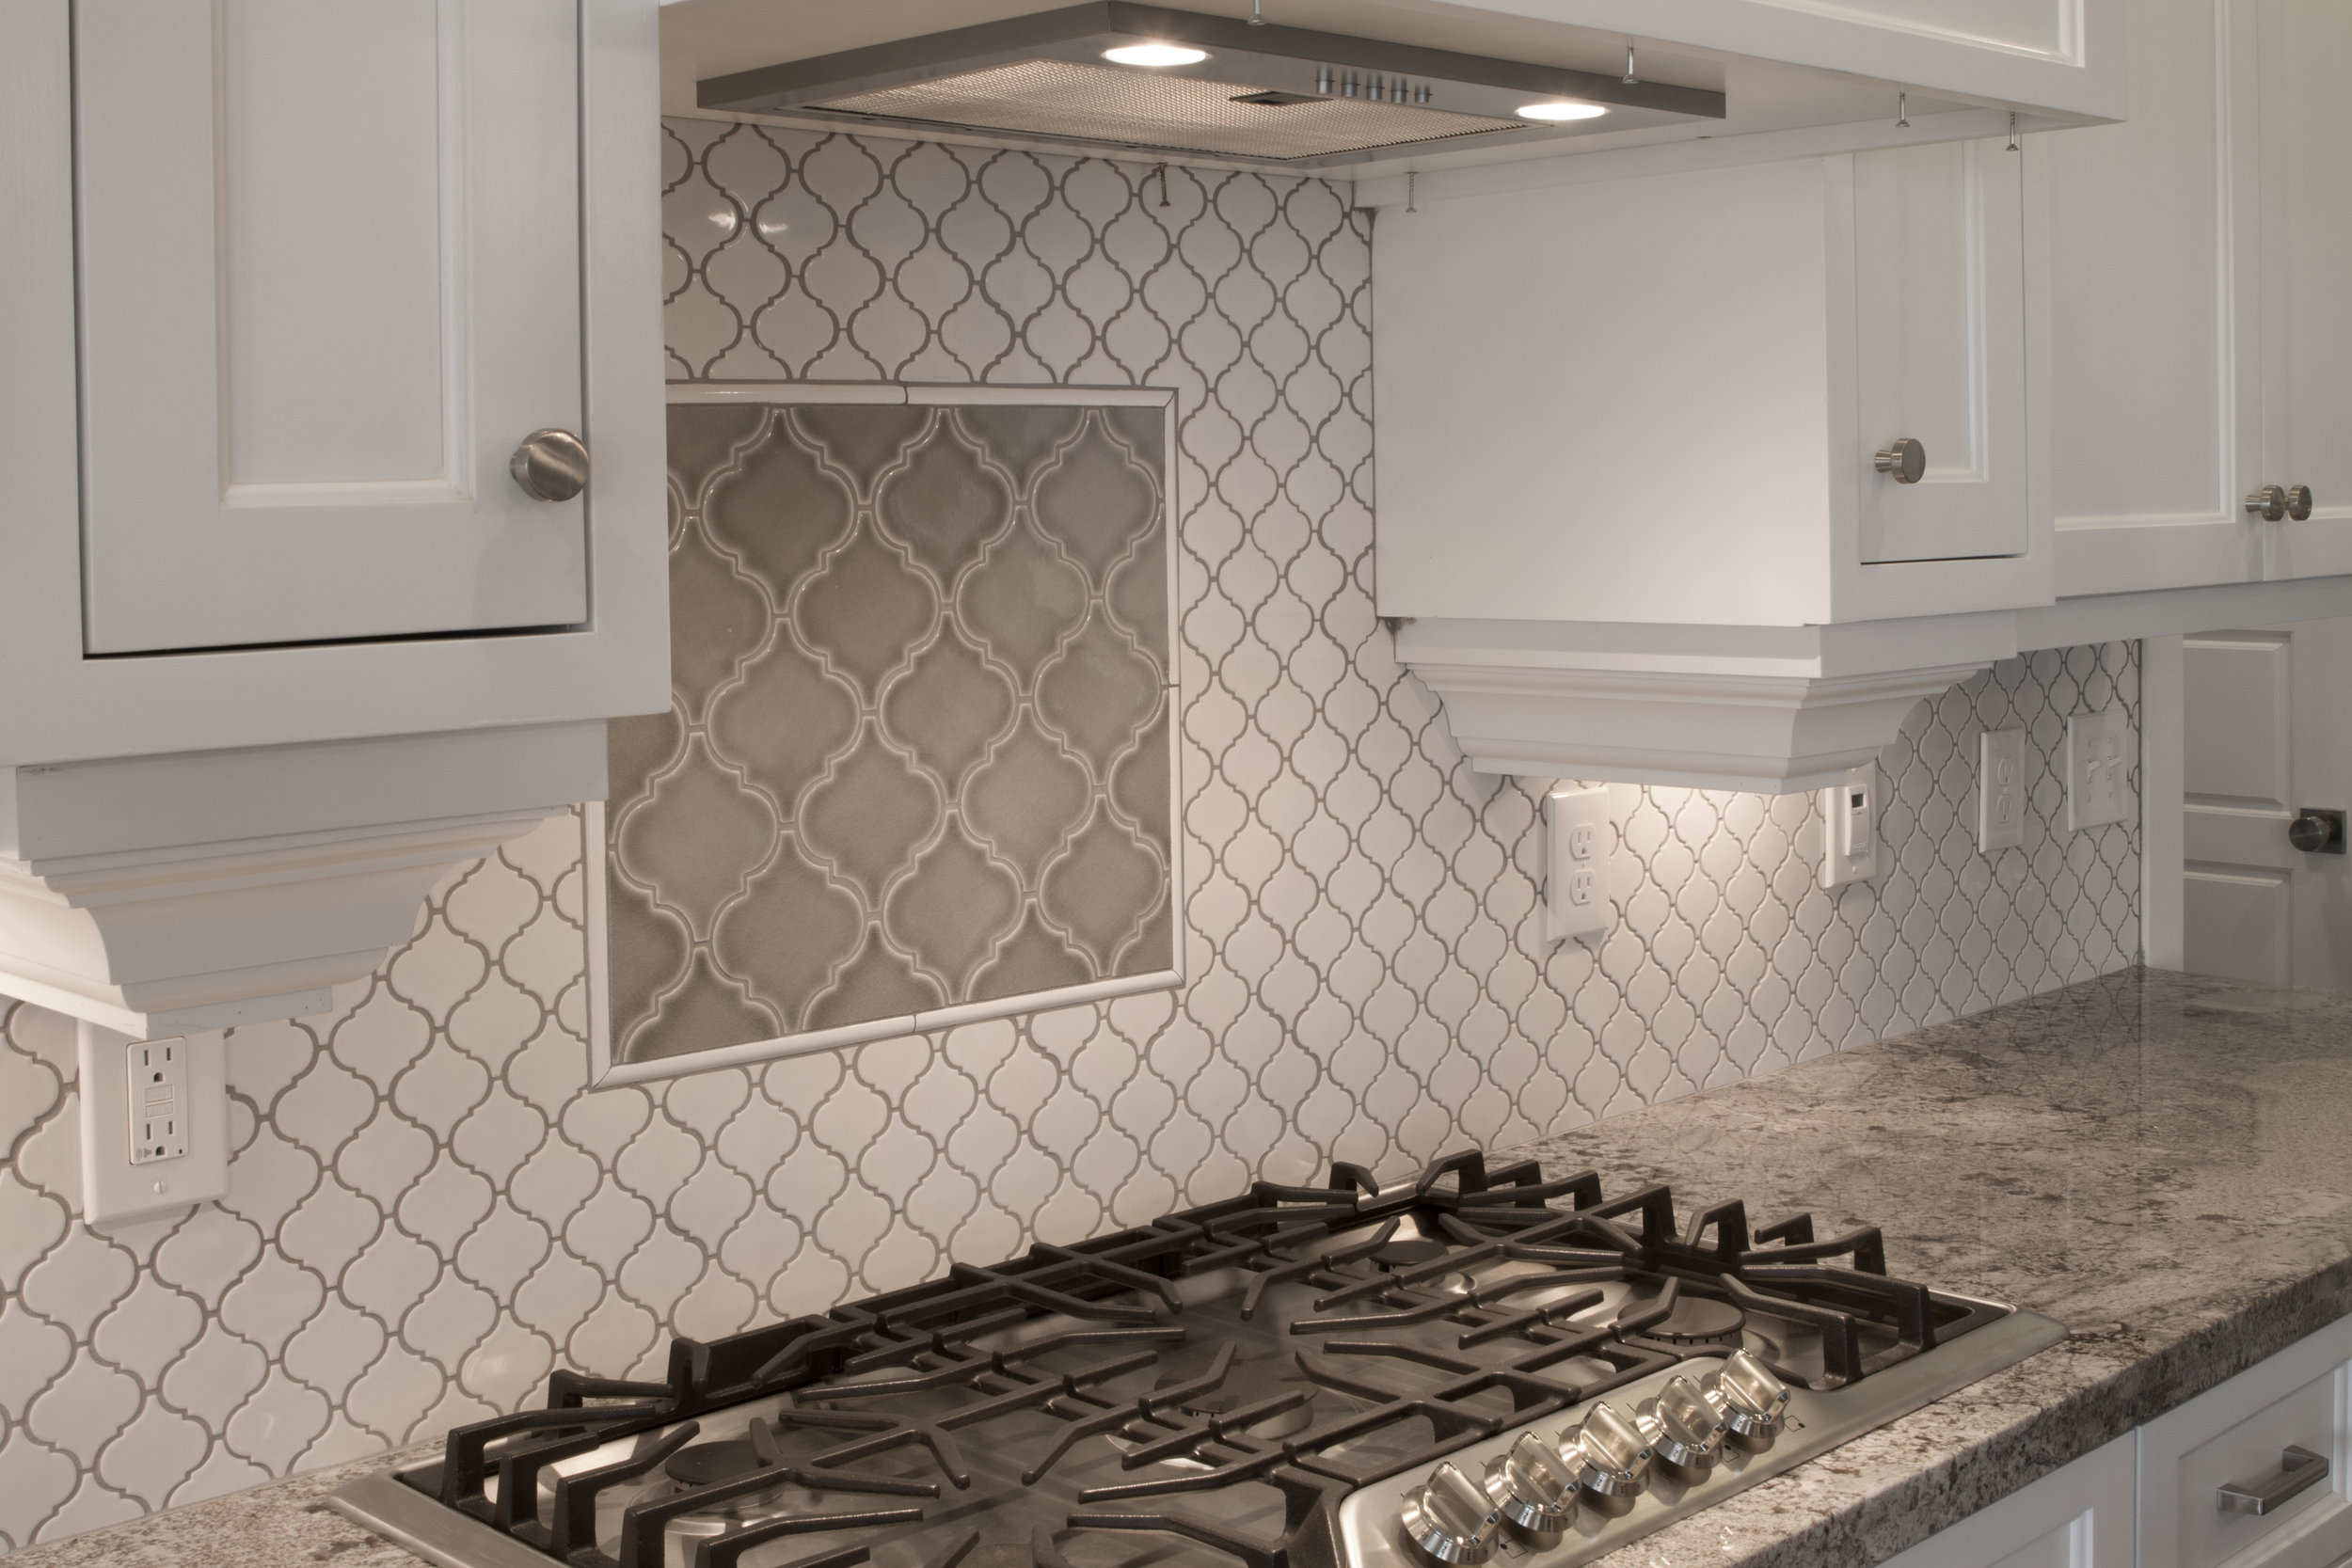 New Kitchen Bathroom Tile Backsplash Installation Rigby 5 Star